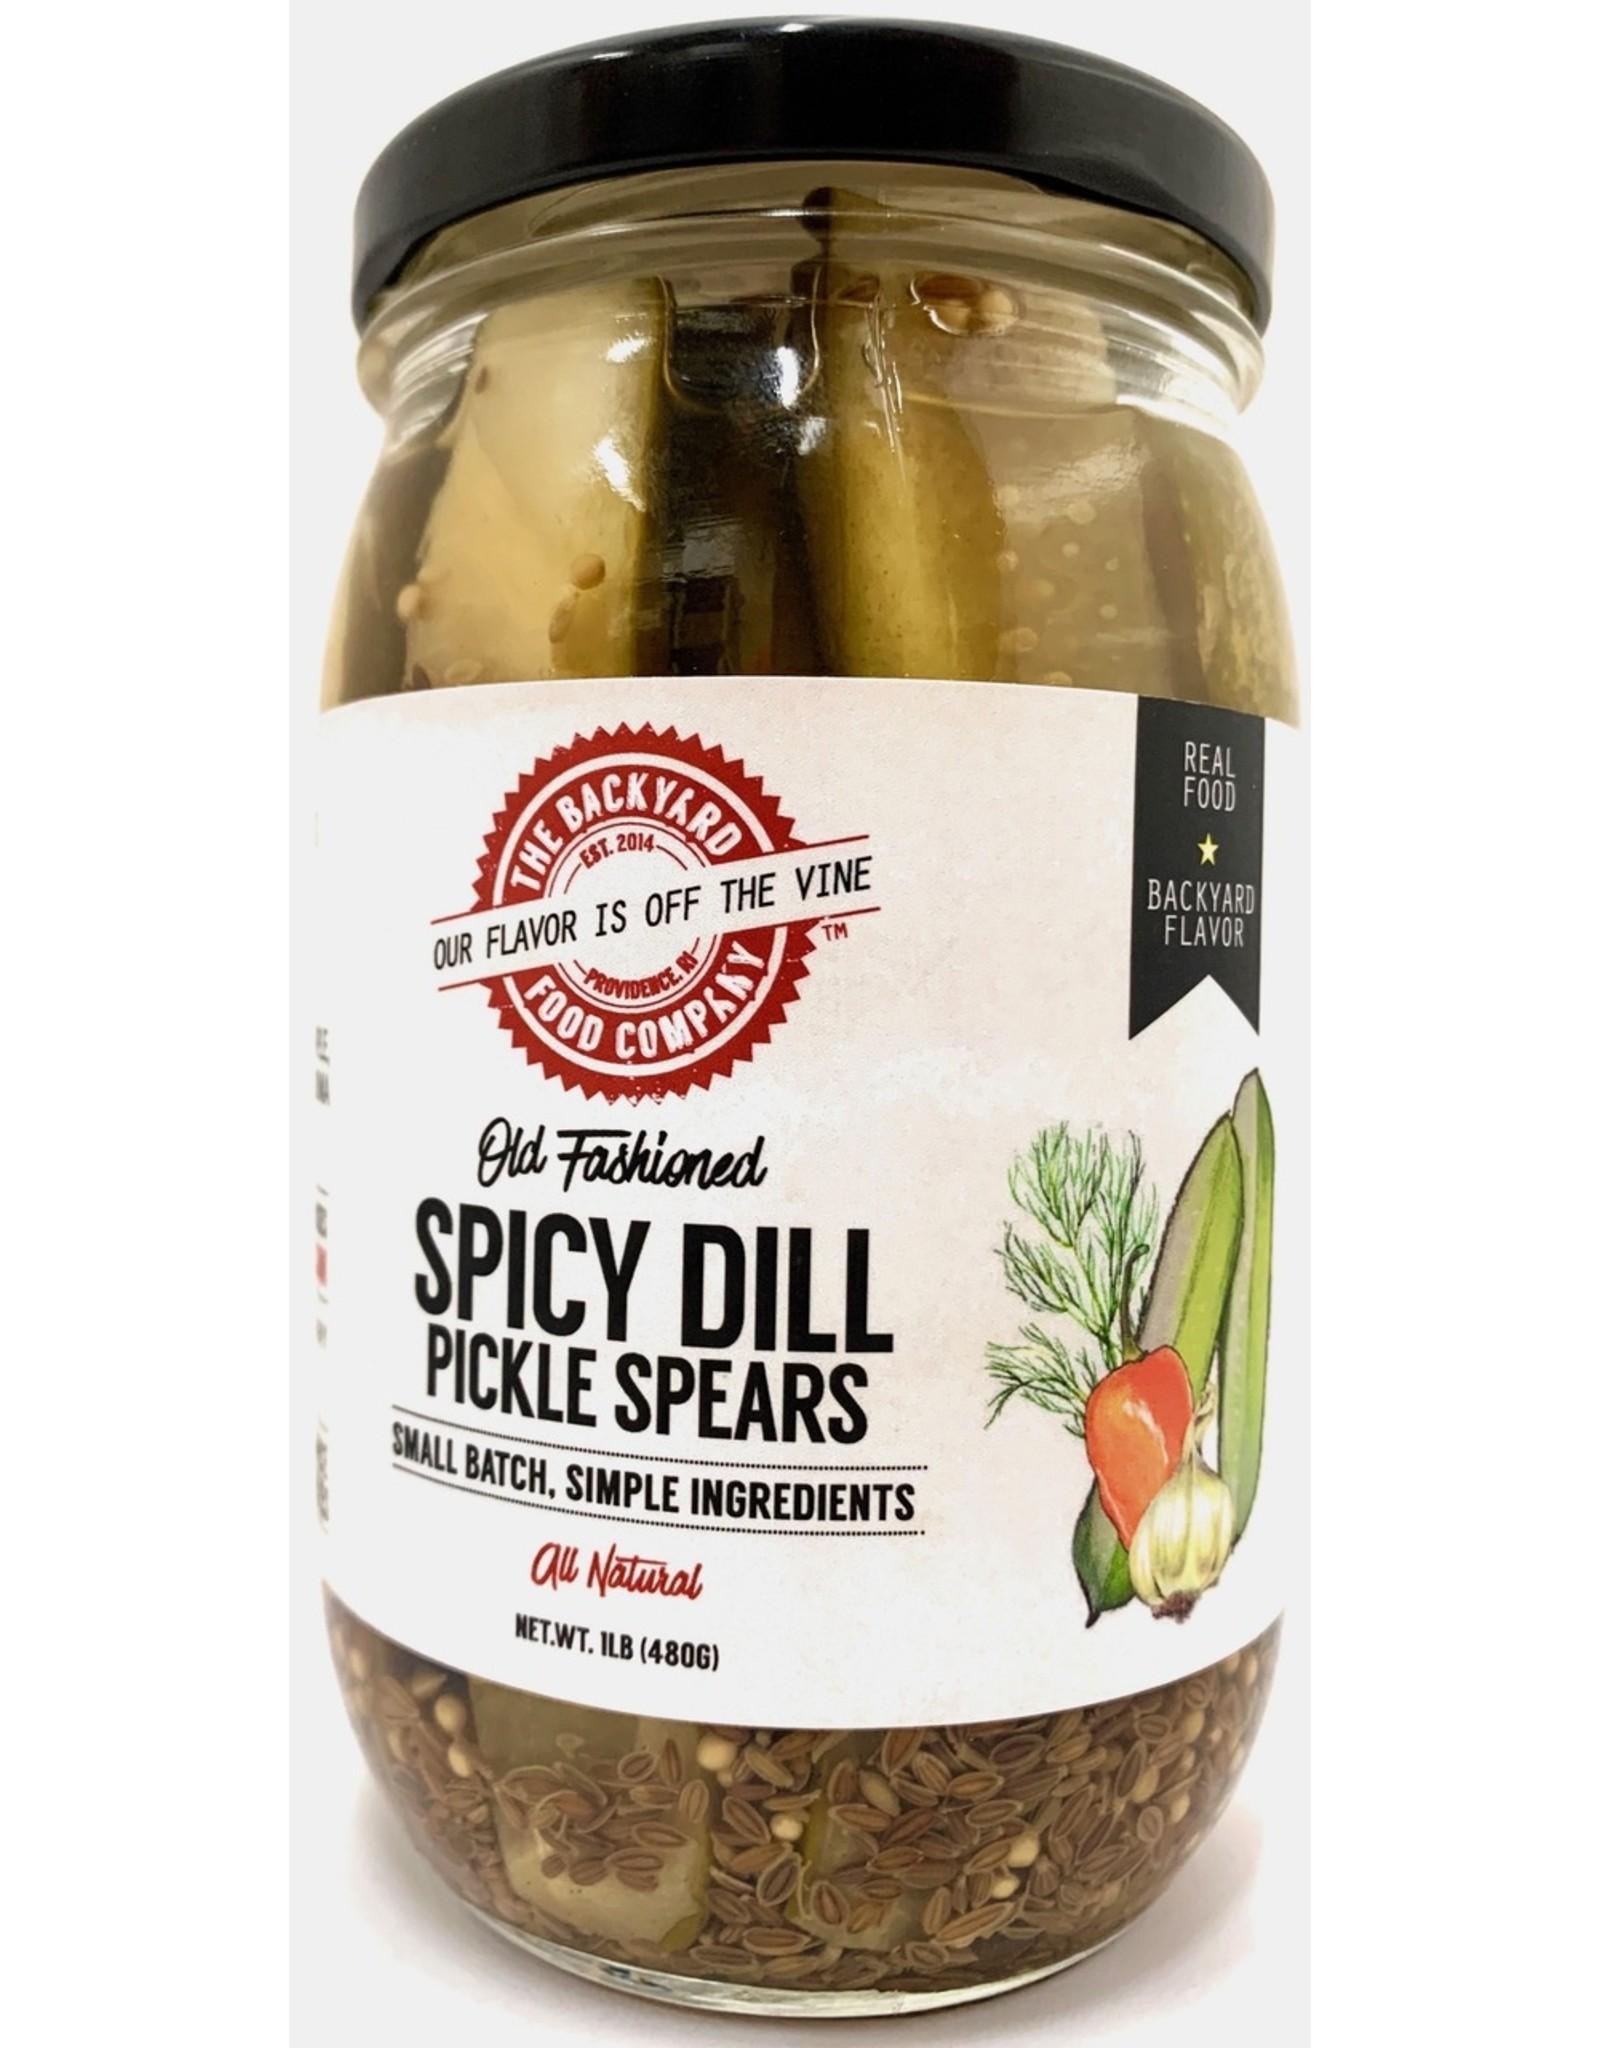 Backyard Food Co. RI Backyard Food Co. Spicy Dill Spear Pickles